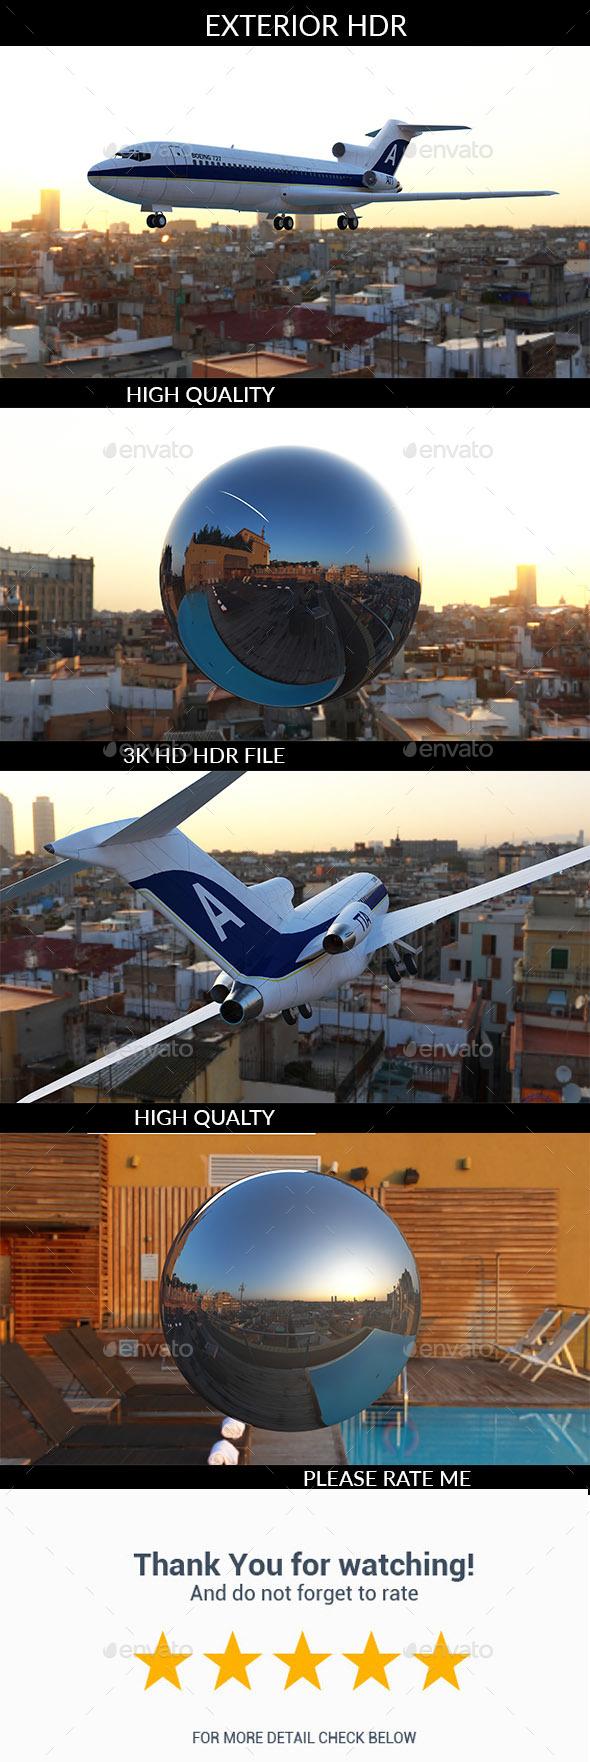 Barcelona HDR - Exterior HDR - 3DOcean Item for Sale